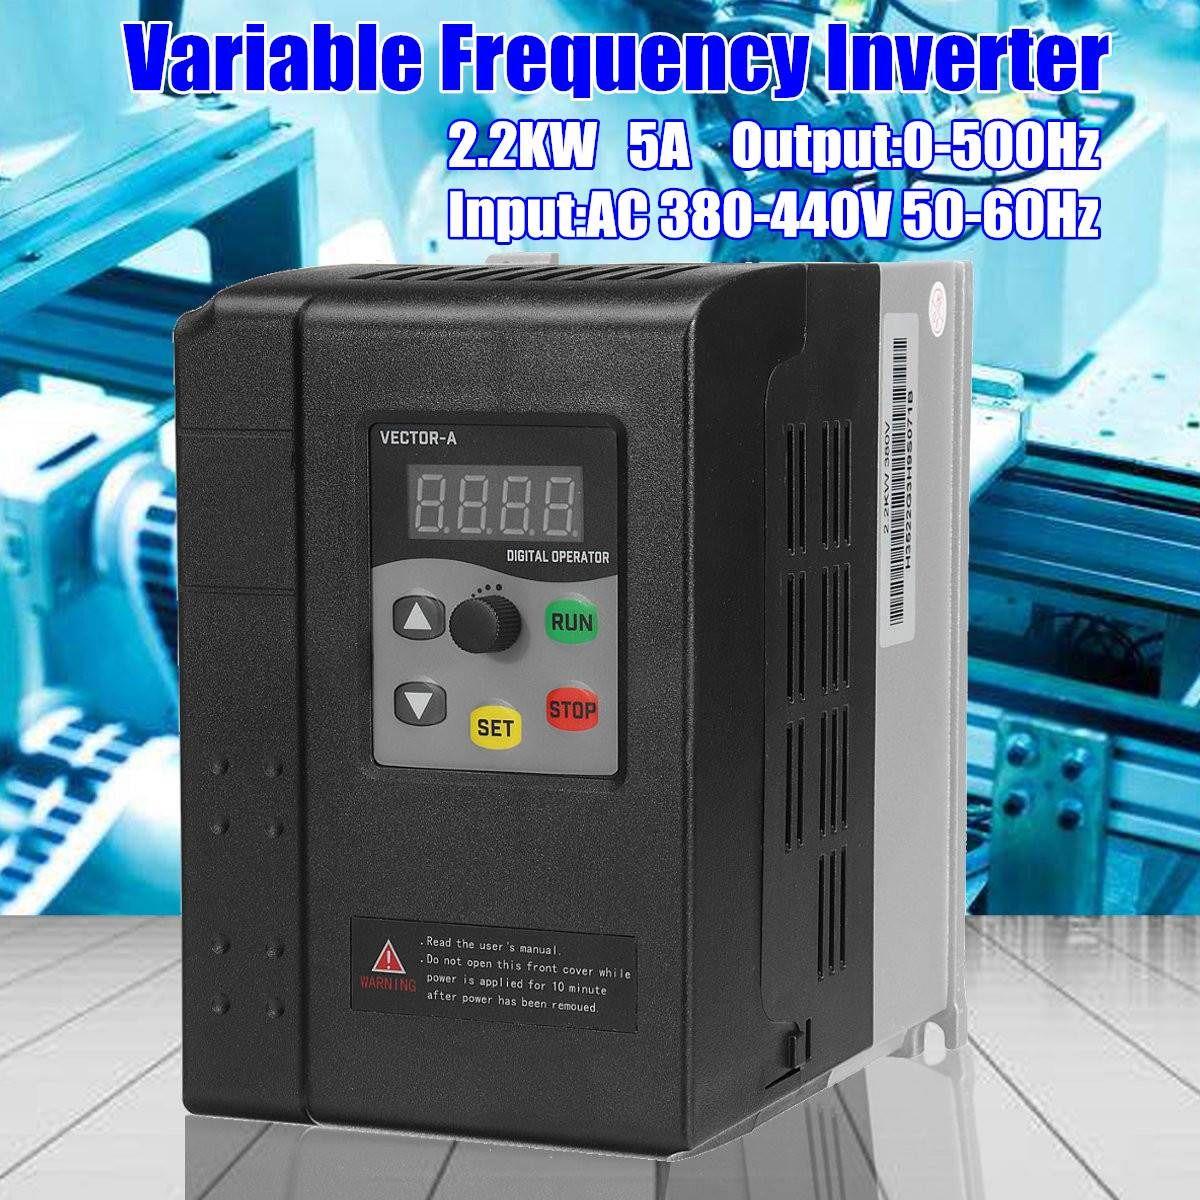 3 Phase 380 V 2.2KW Mini VFD Variable Frequency Inverter für Motor Speed Control Frequenz Konverter